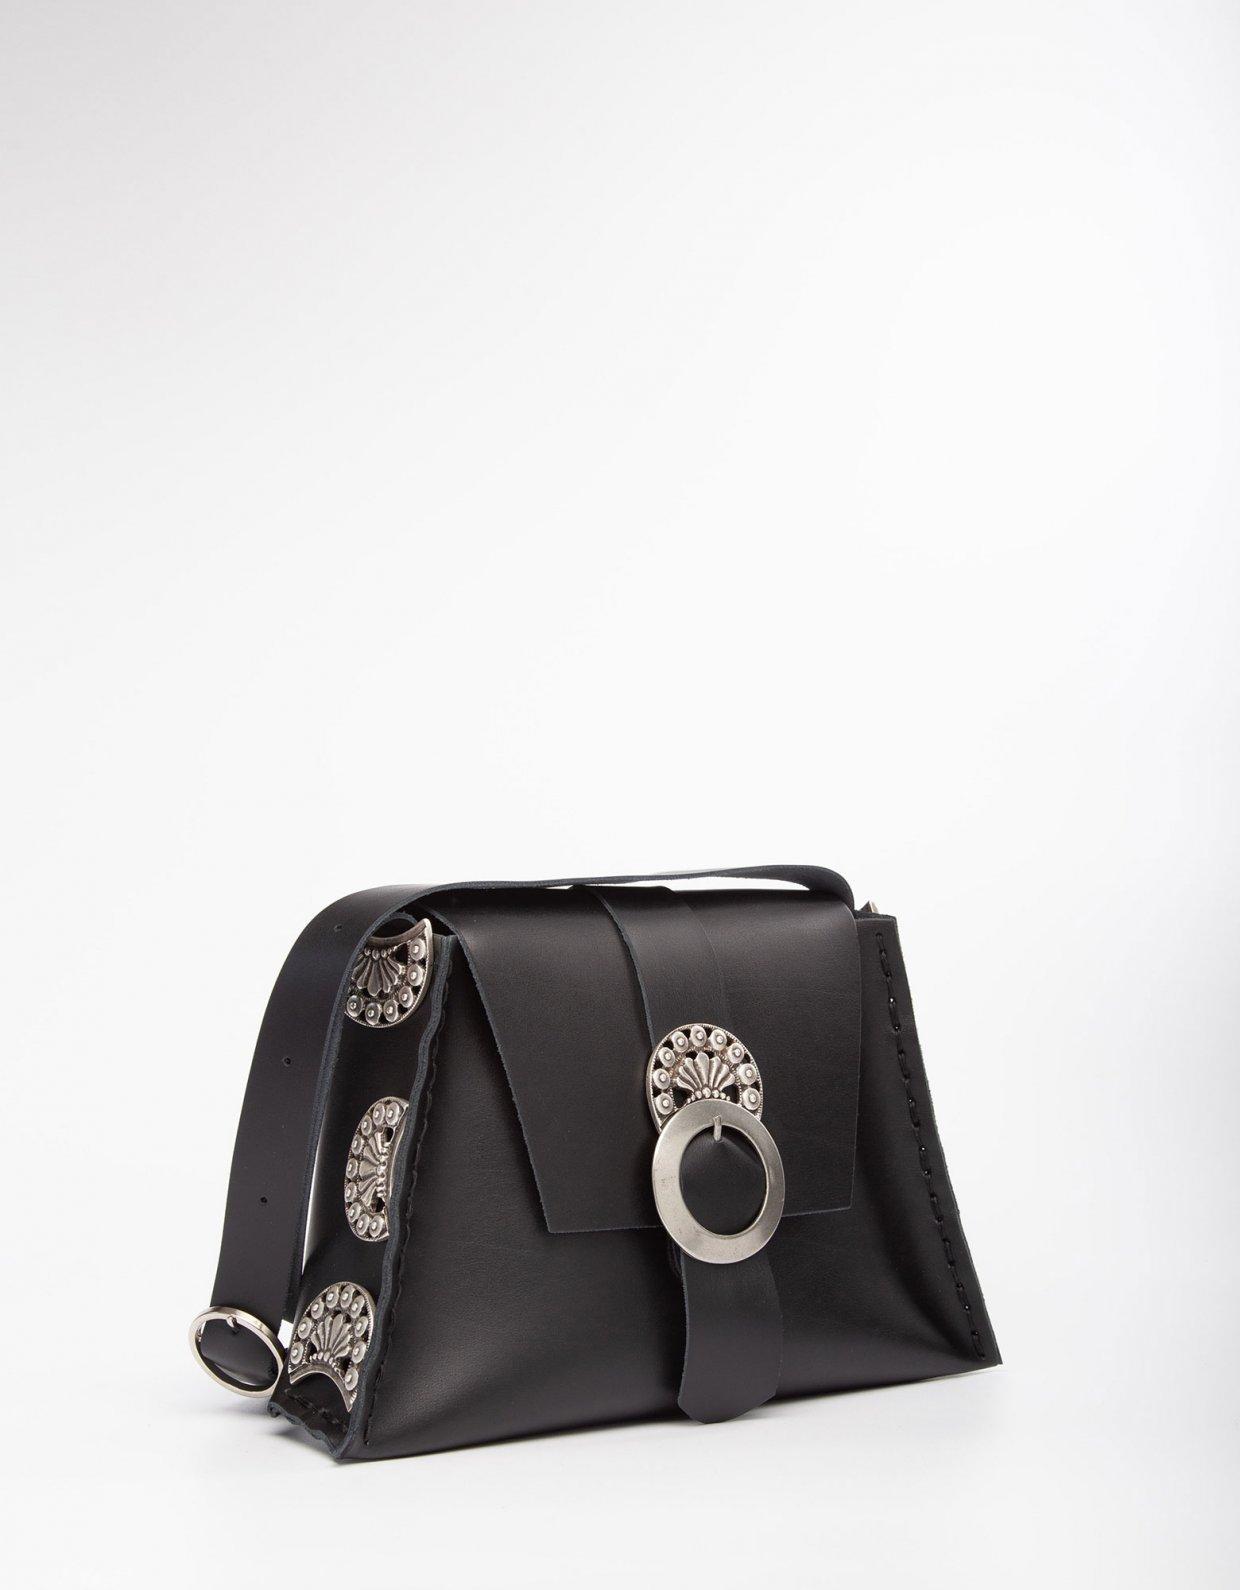 Individual Art Leather Modern love black bag